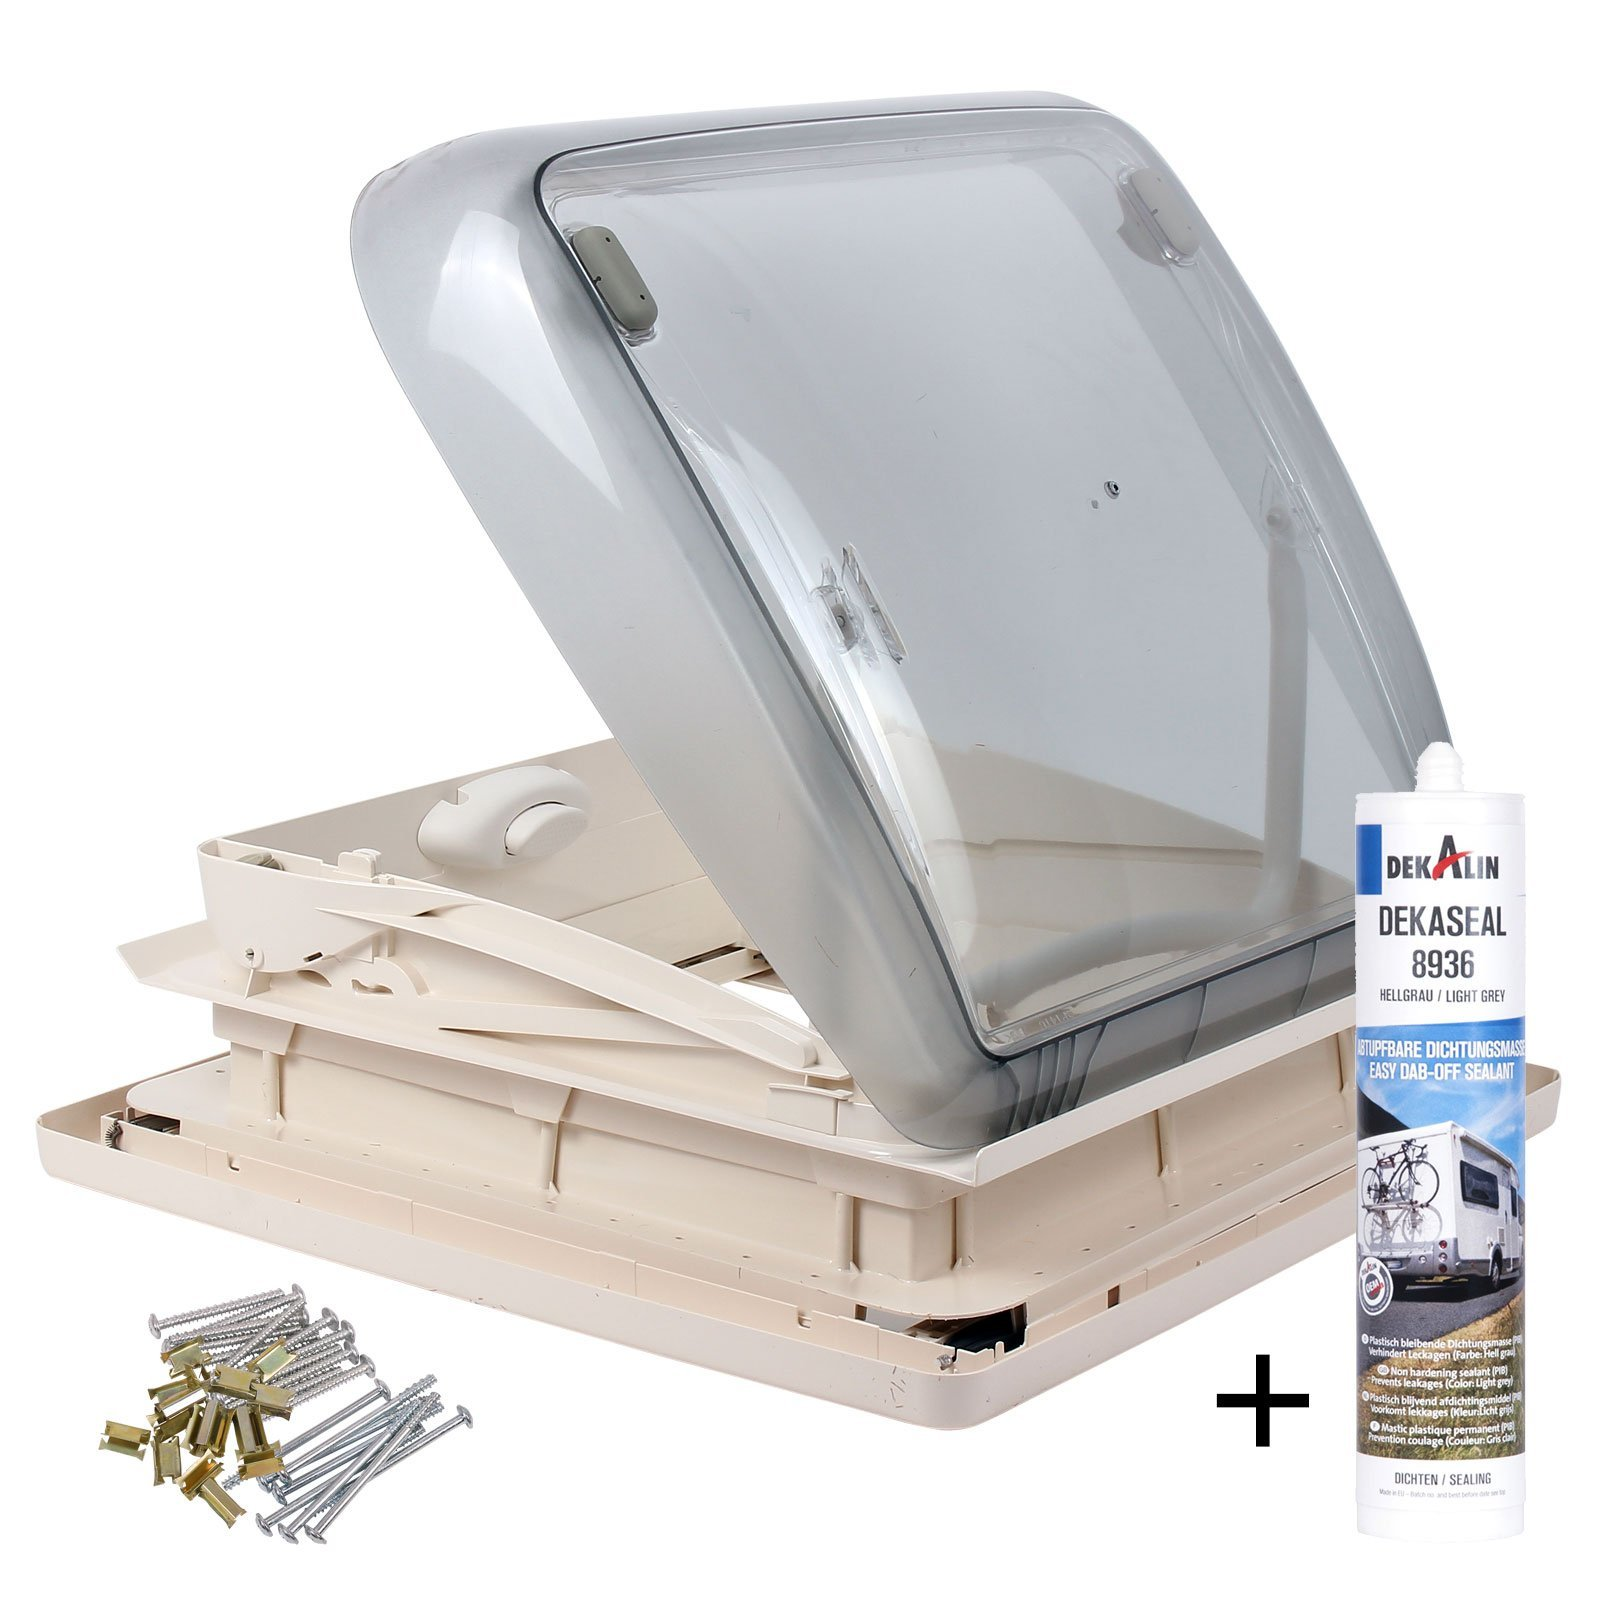 Dometic - Dekalin Dometic Mini Heki 40x 40Roof thickness 25-45 mm Straight Ventilation And Dekalin sealant For caravan Or camper